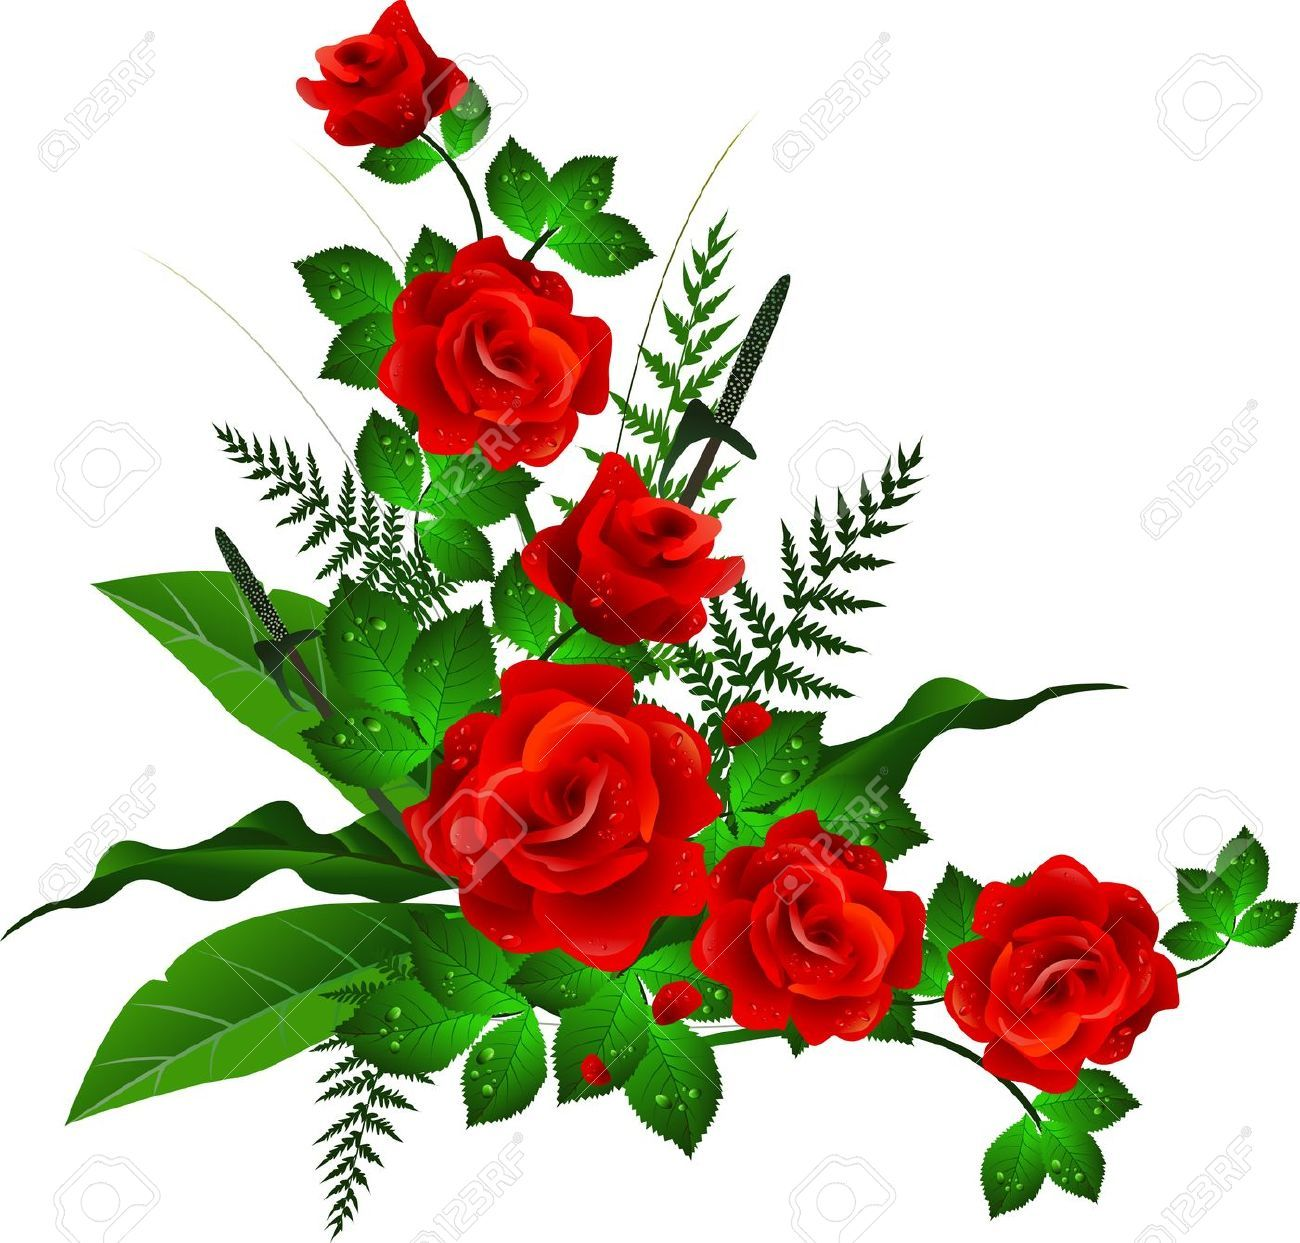 flowers for vintage oval frames - Google Search | scrapbooking ... for Vector Rose Flower Png  34eri